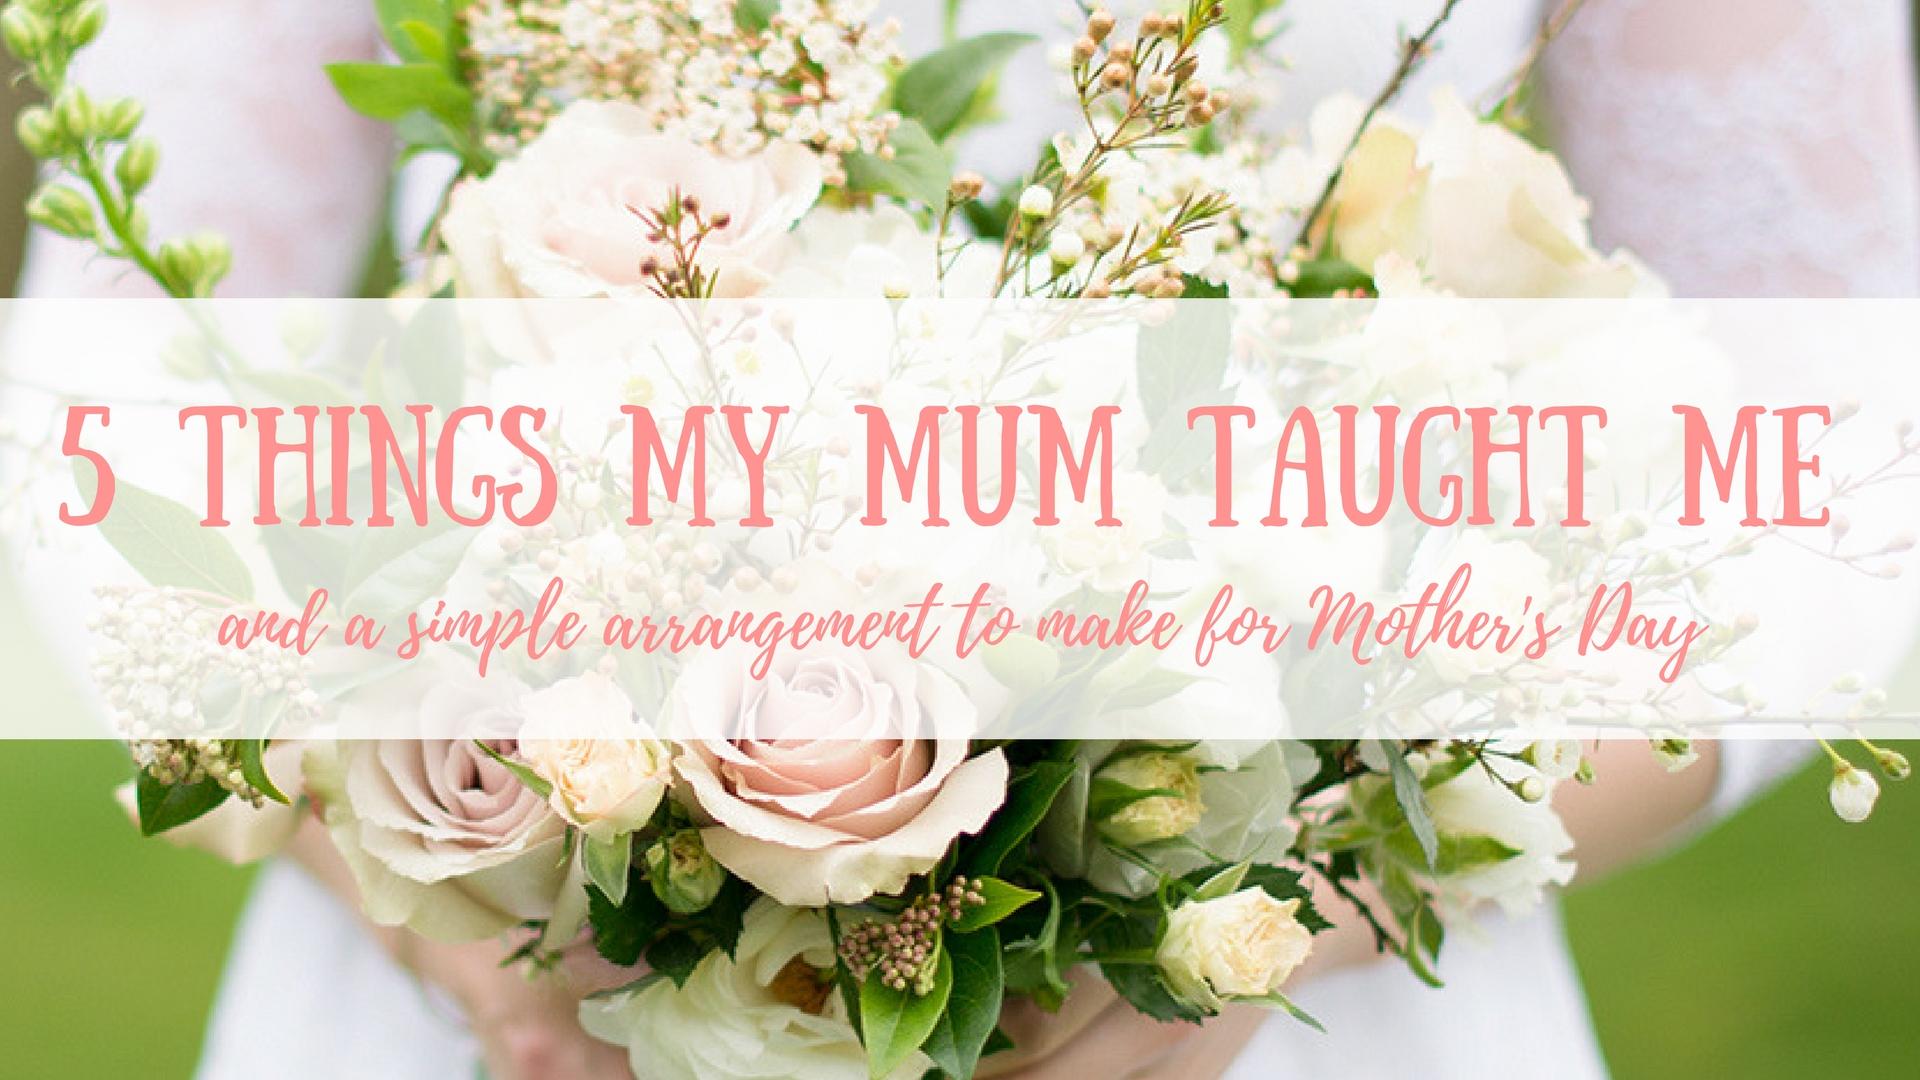 5 Things My Mum Taught Me